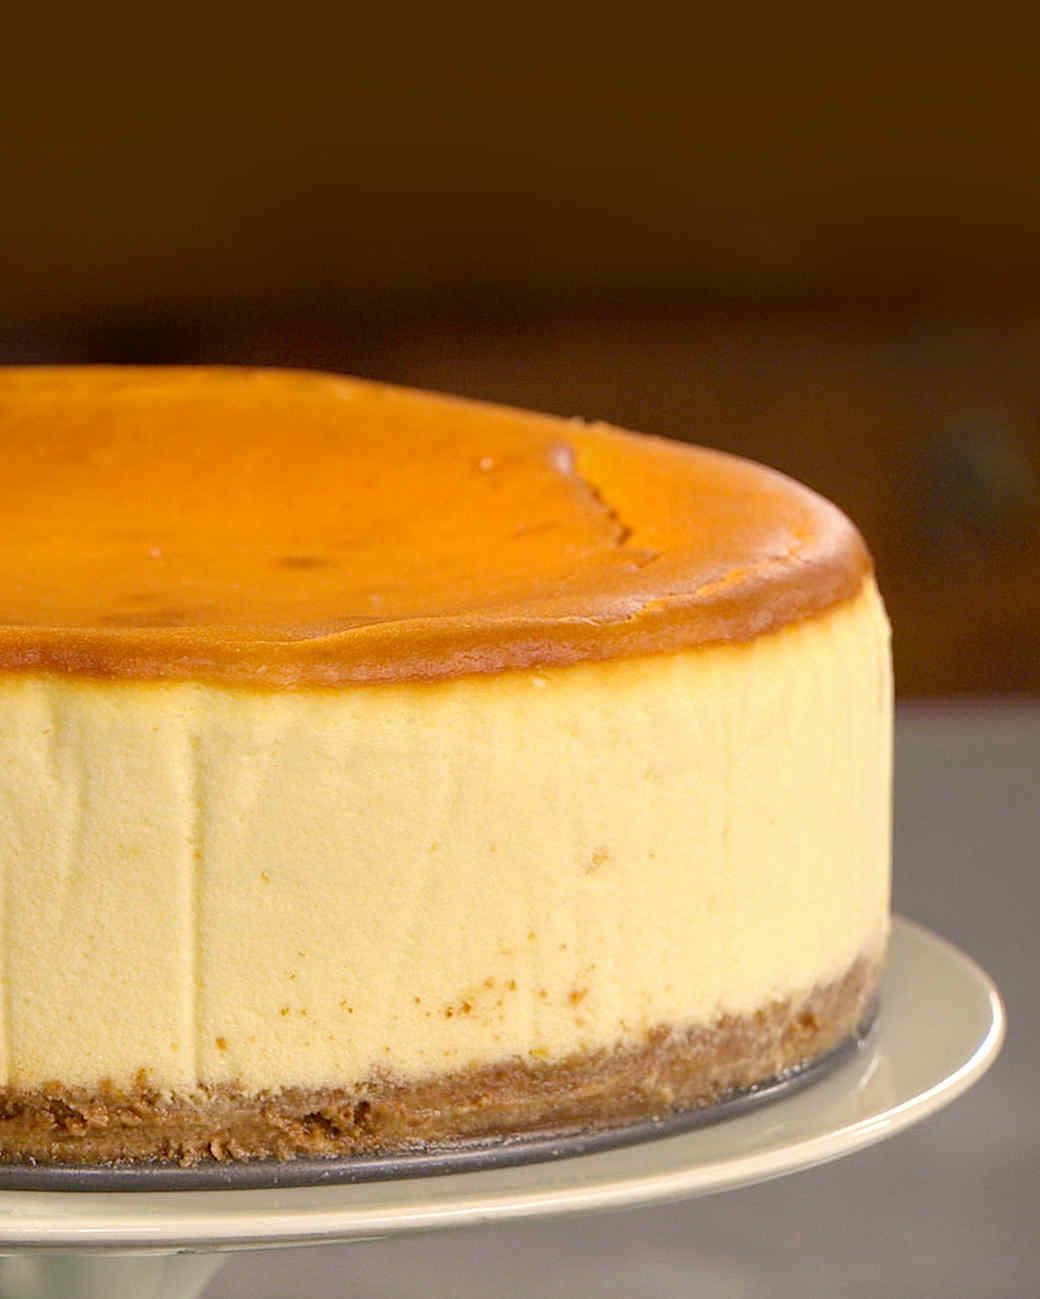 new york style cheesecake recipe martha stewart. Black Bedroom Furniture Sets. Home Design Ideas